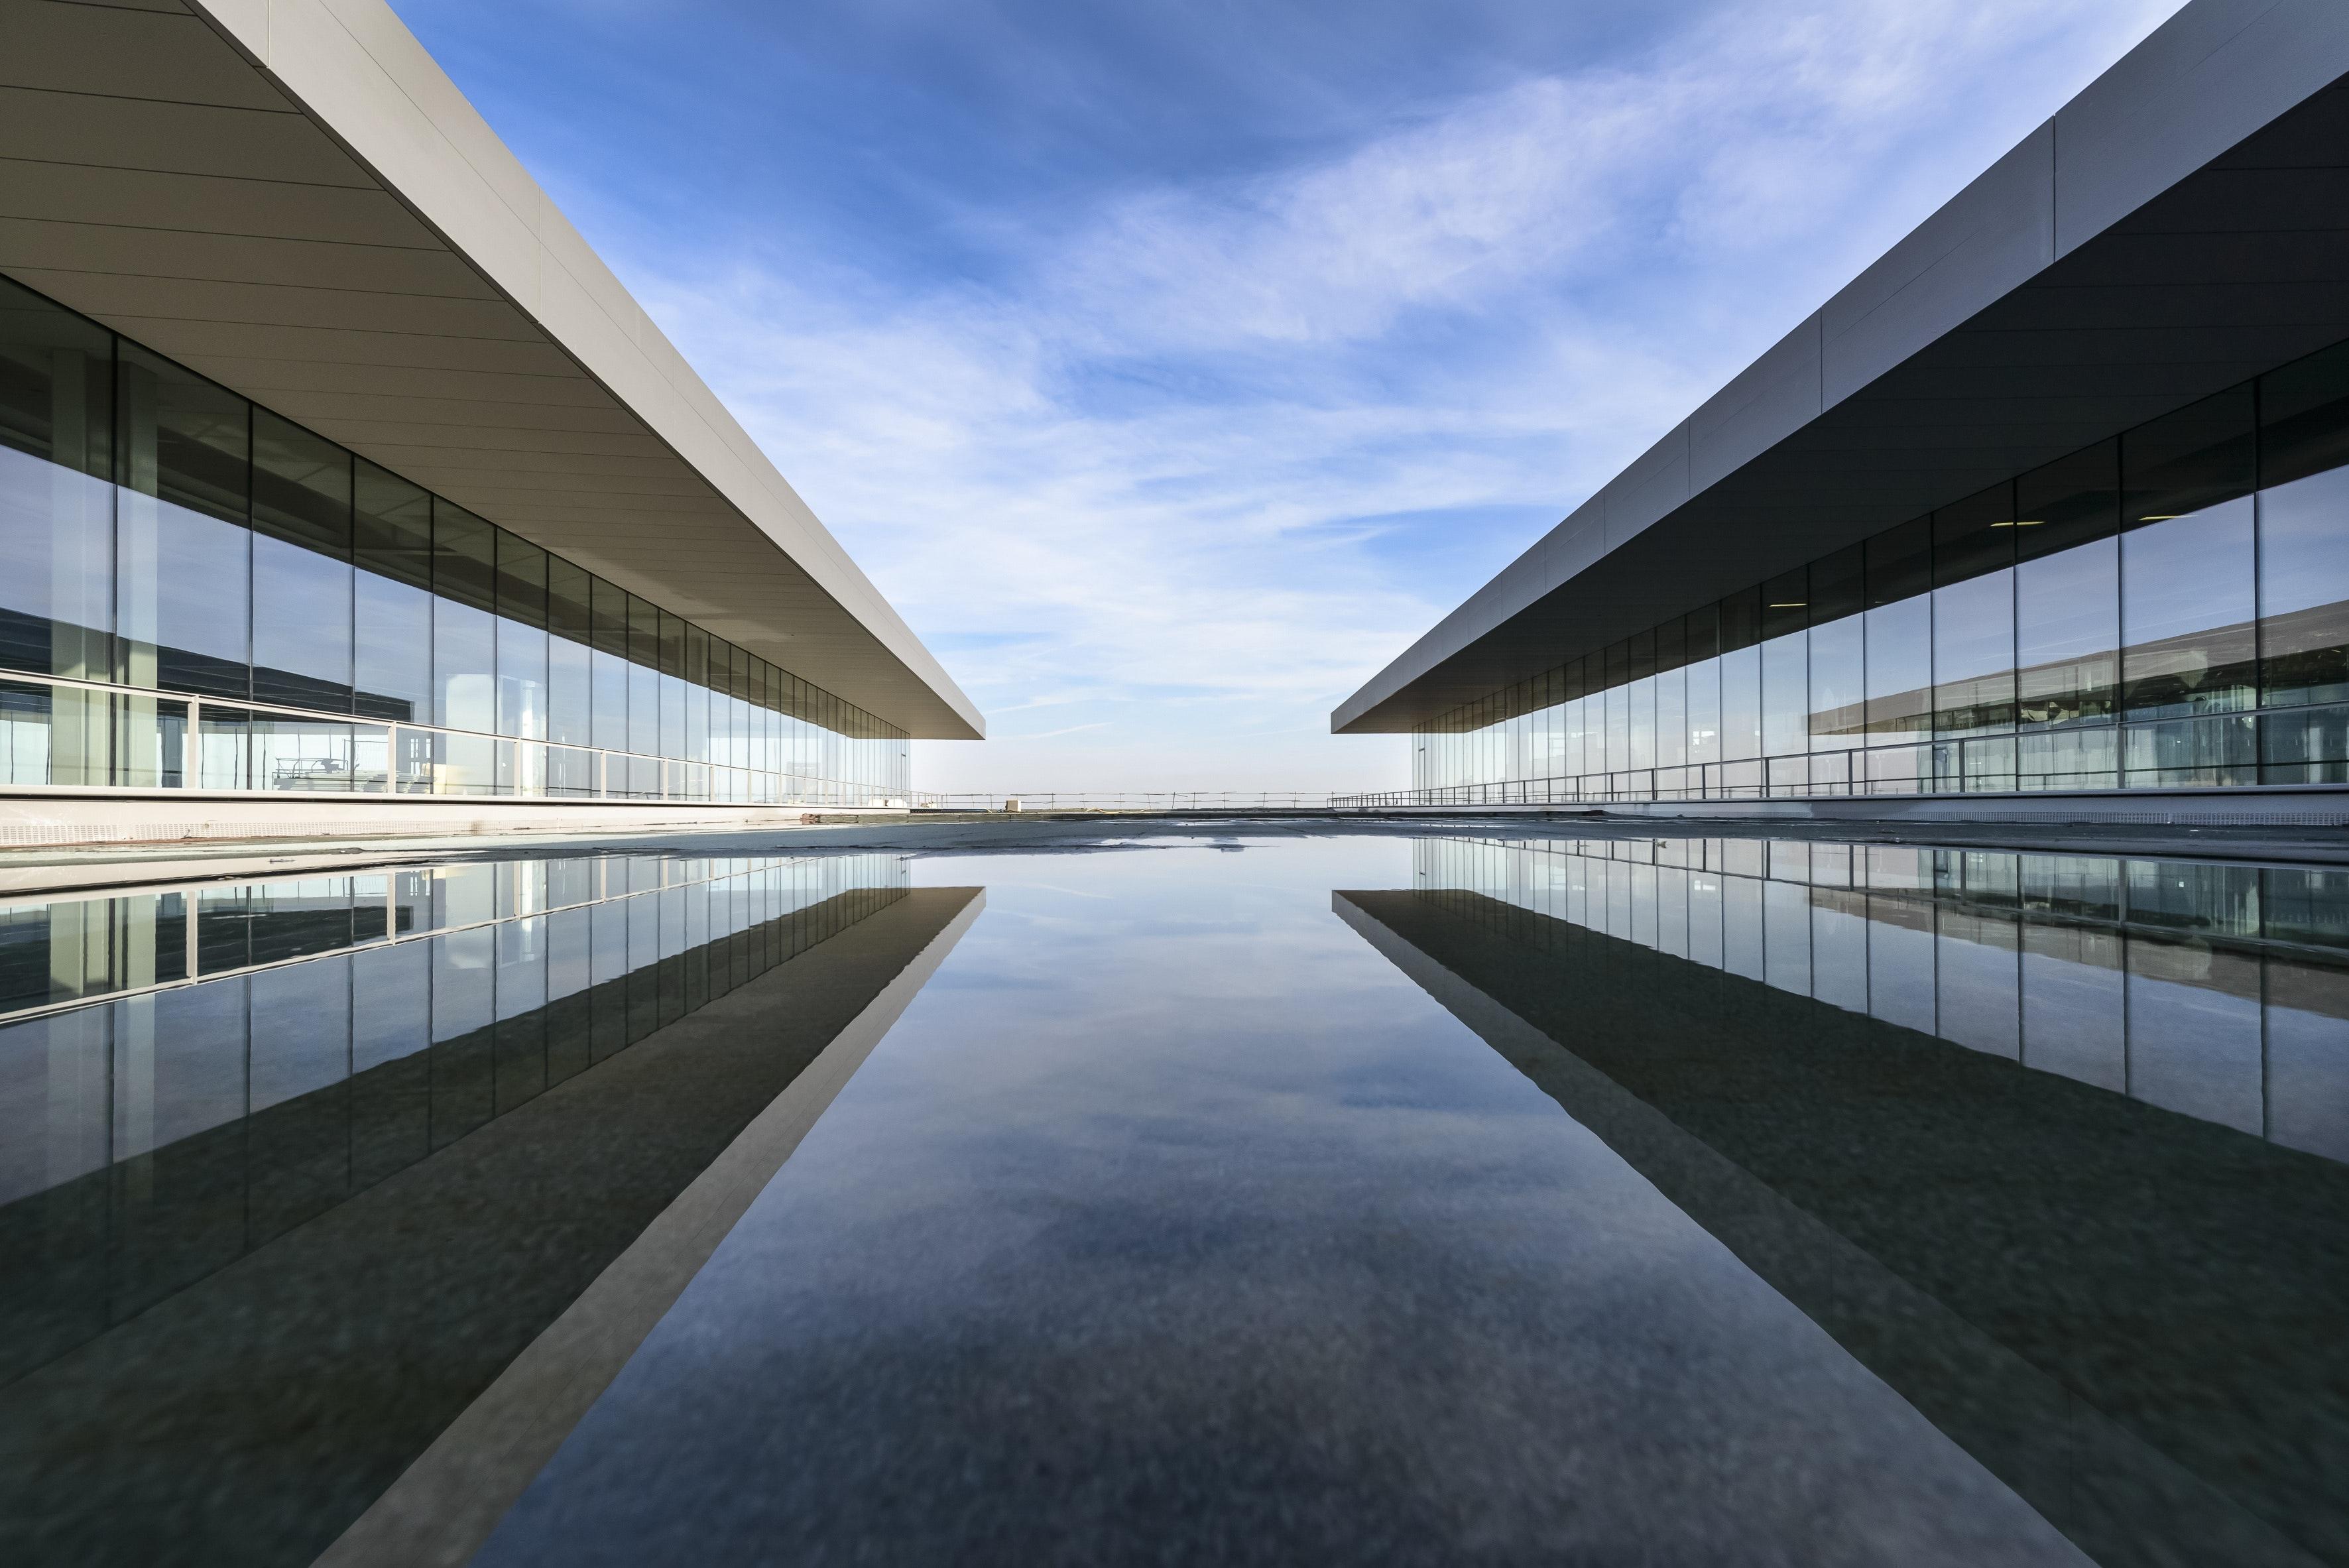 architectural-design-architecture-buildings-534174